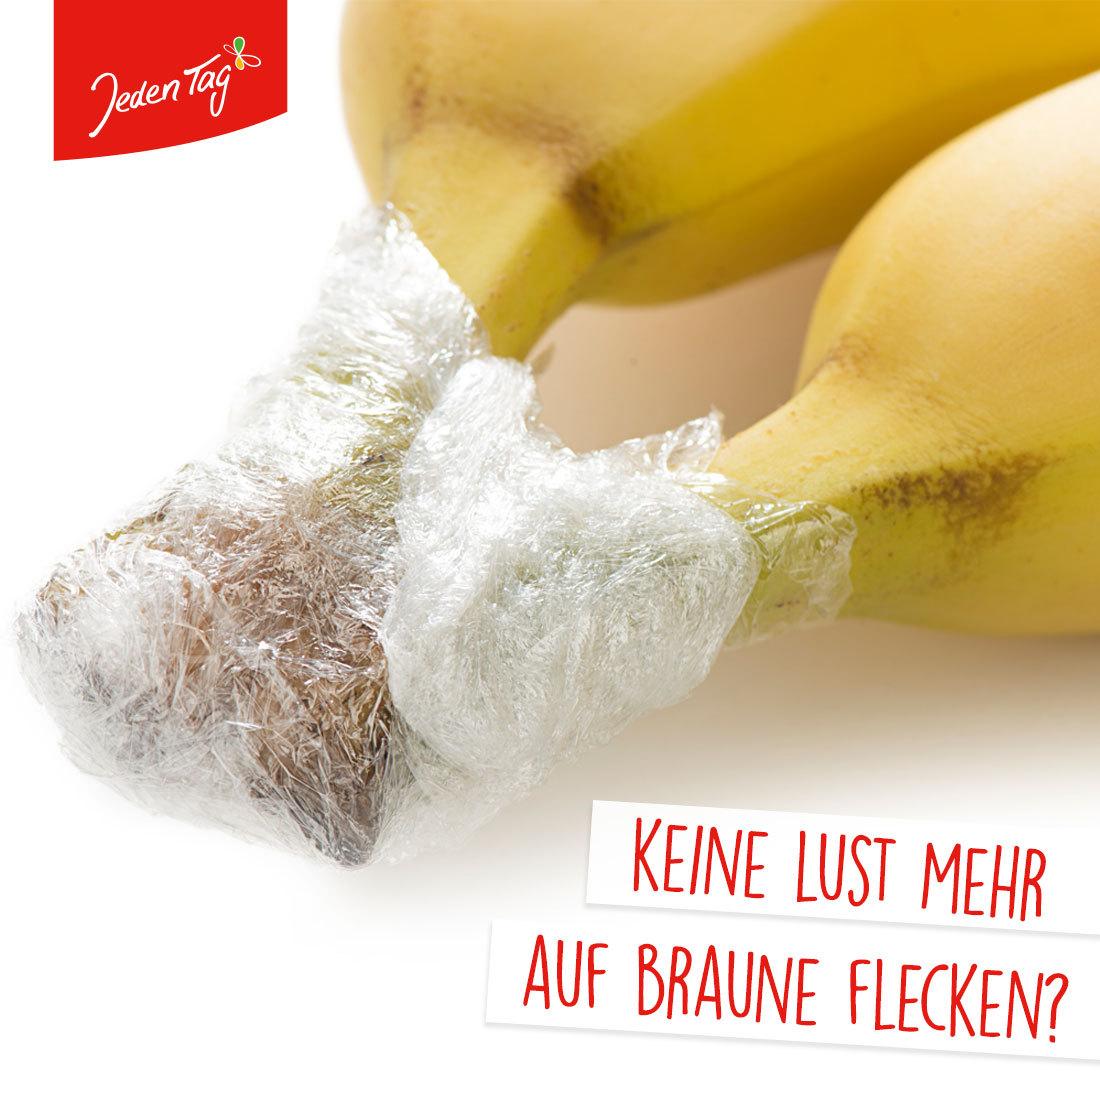 Jeden Tag-Hack: So bleiben Bananen länger frisch